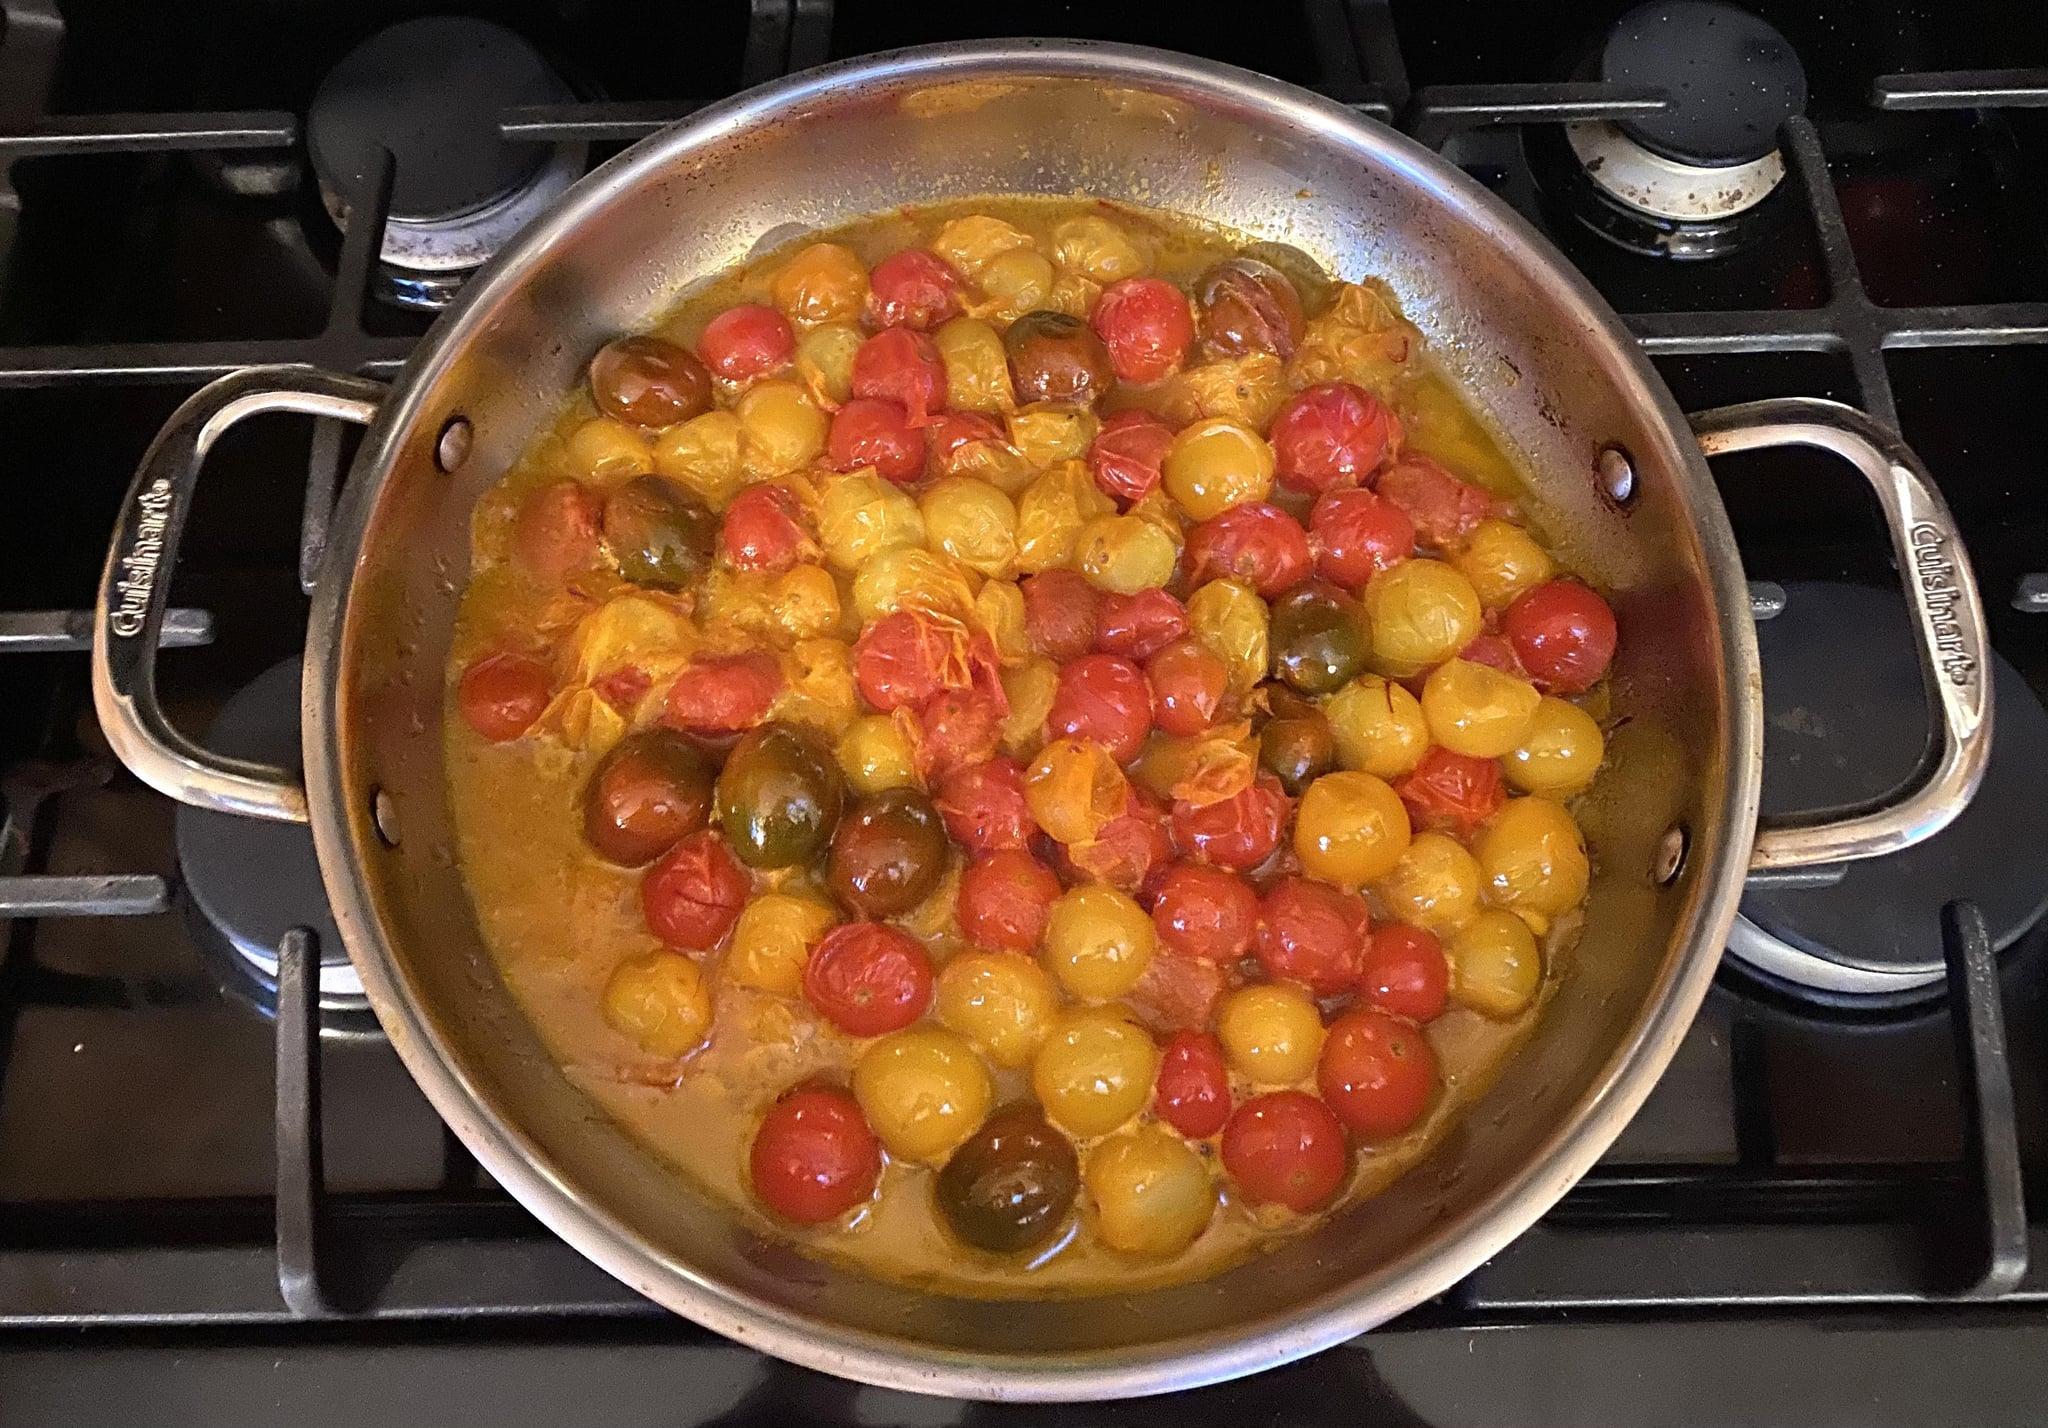 tmp_rZaT83_e31f74939a9c0bde_Blistered_Tomatoes.jpg